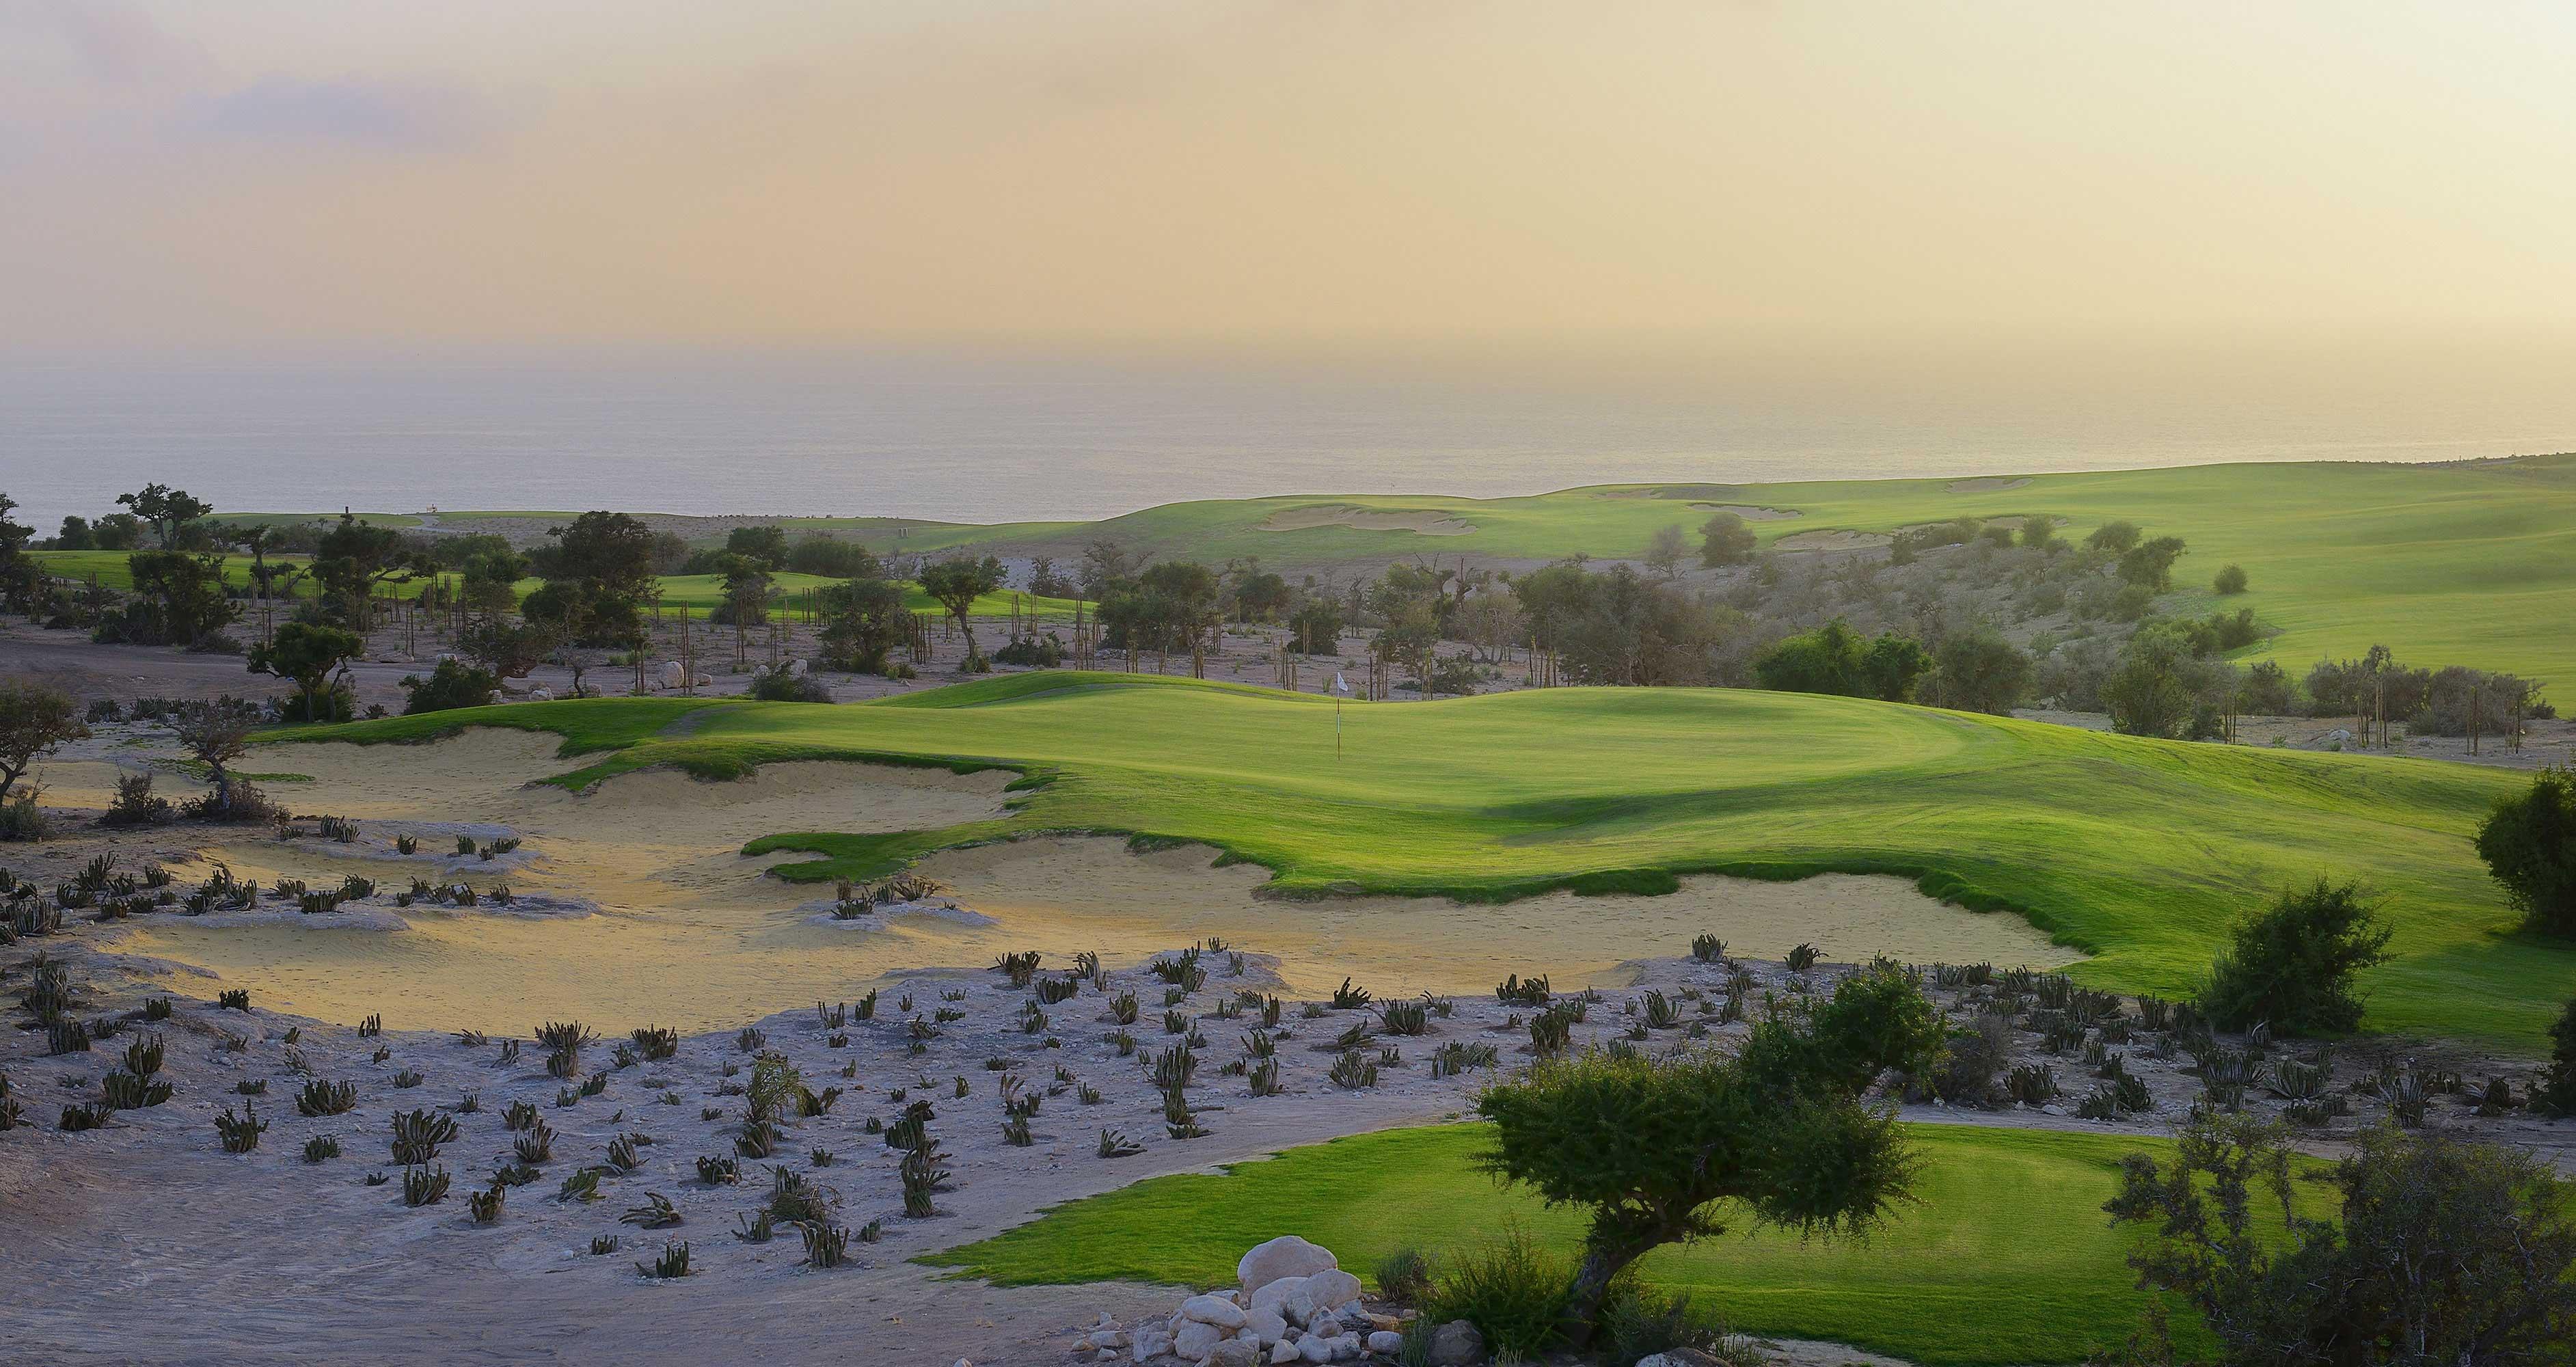 Un grand bunker du golf de Tazegzout.